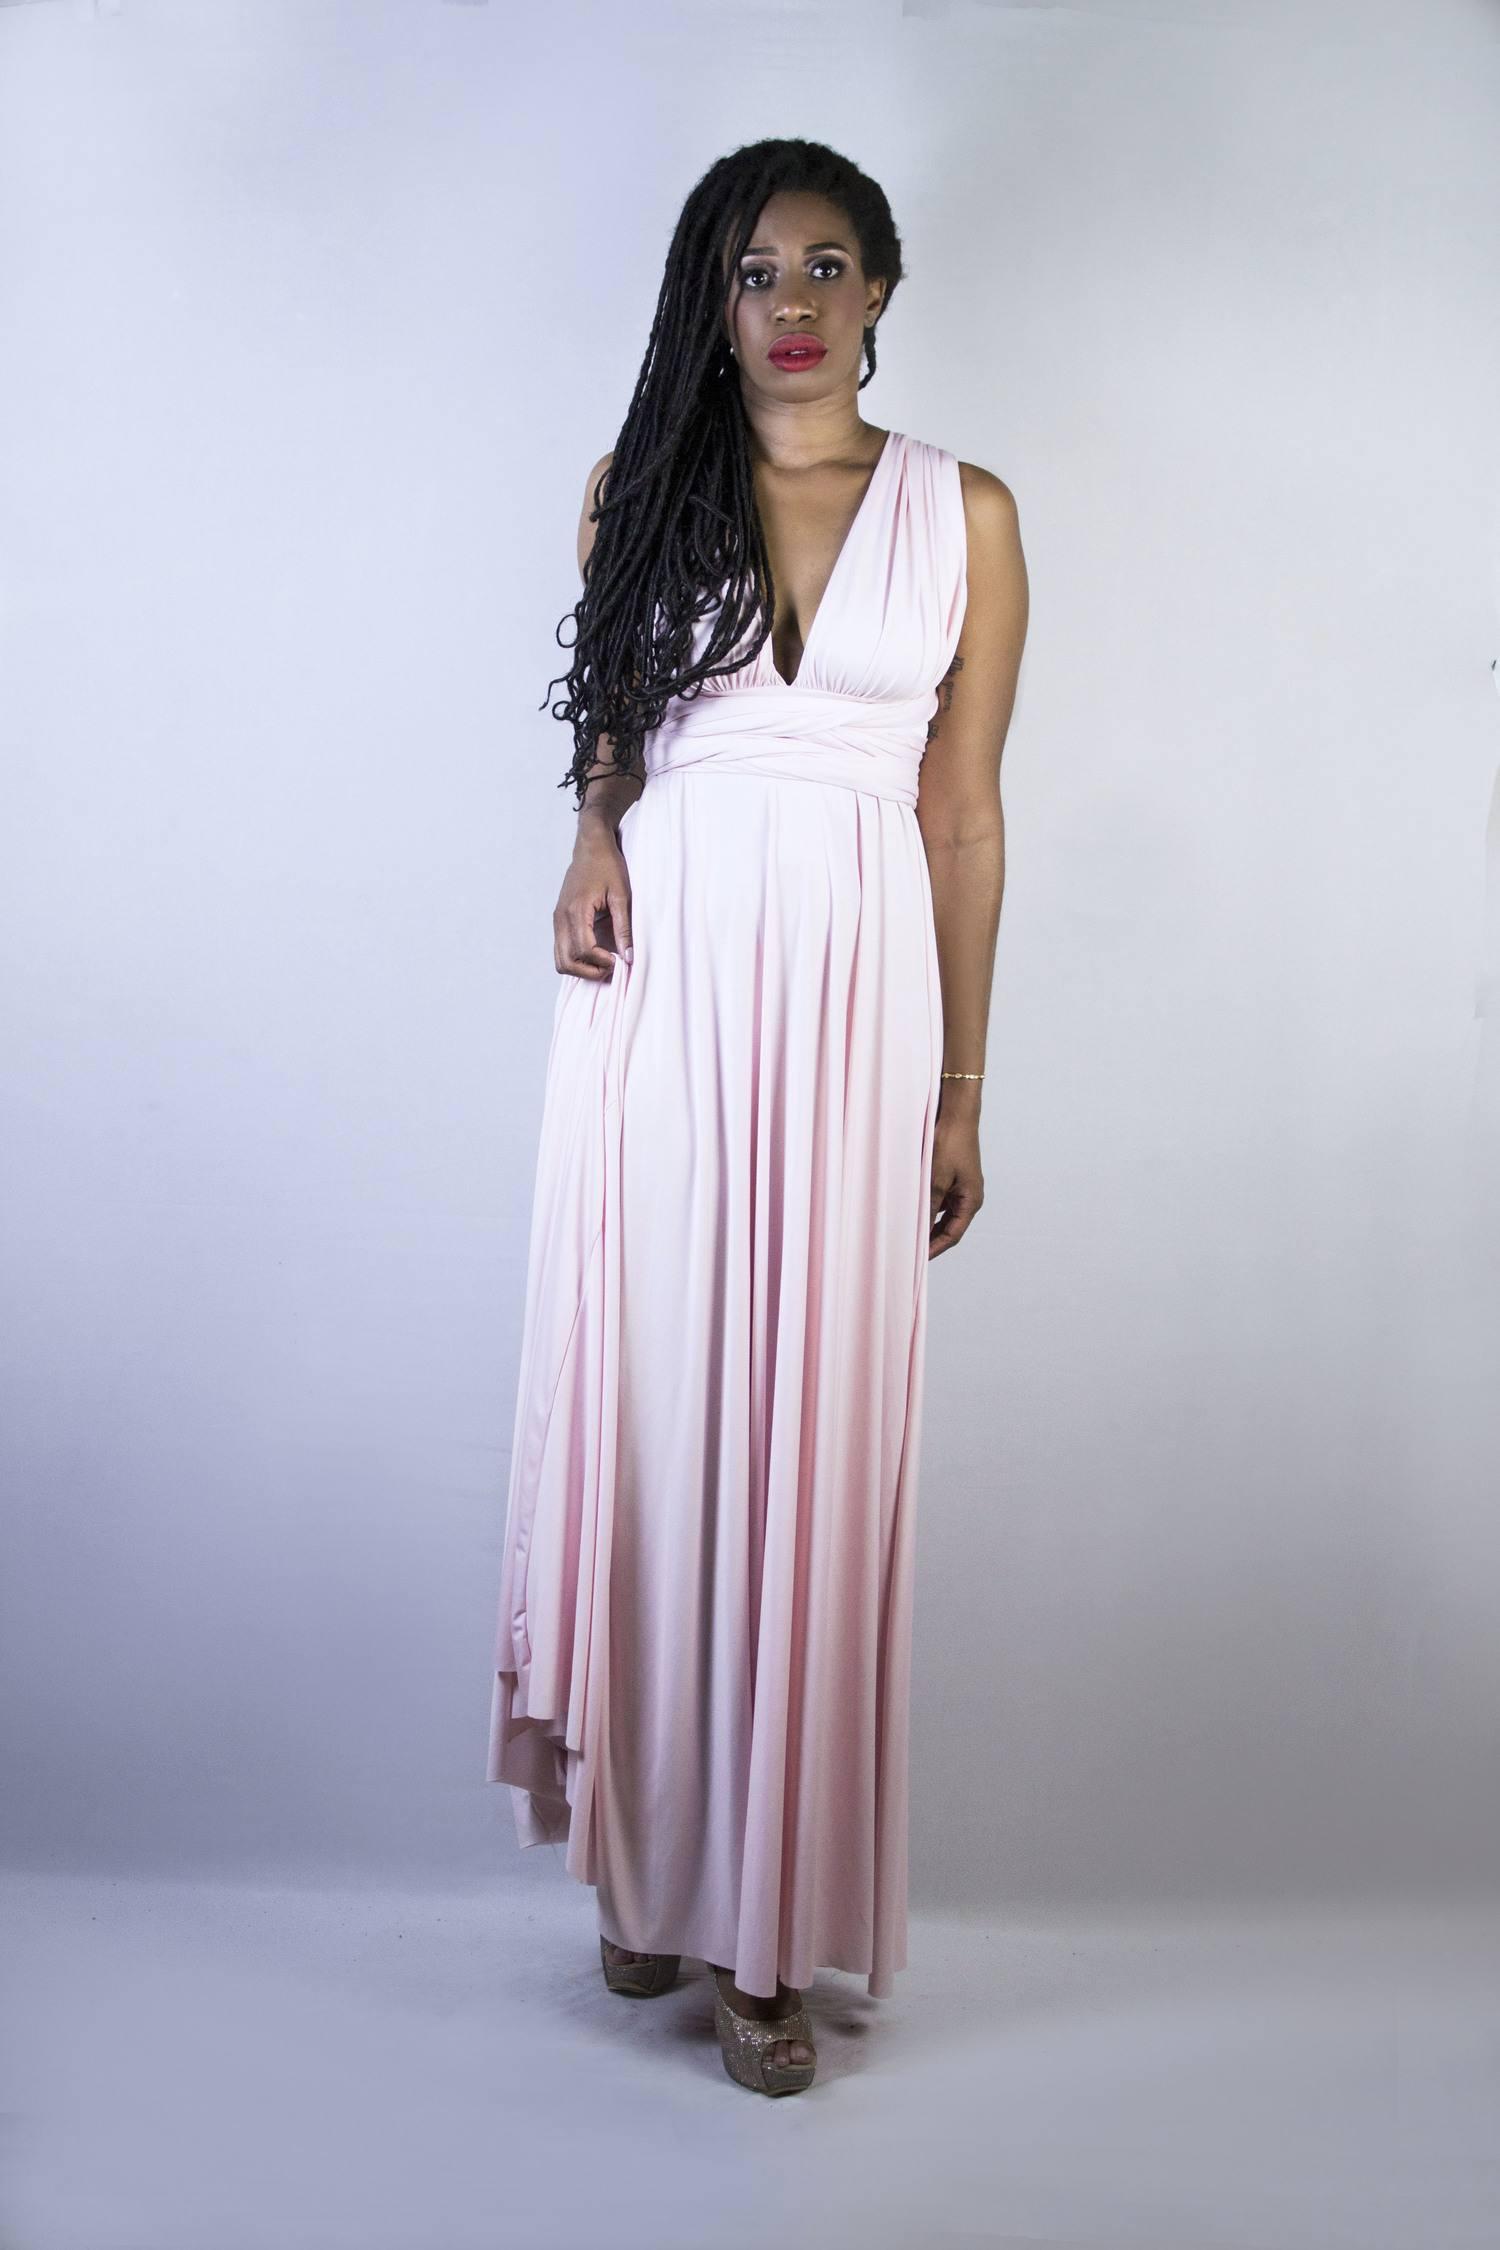 Vestido Longo De Festa Infinity Samara